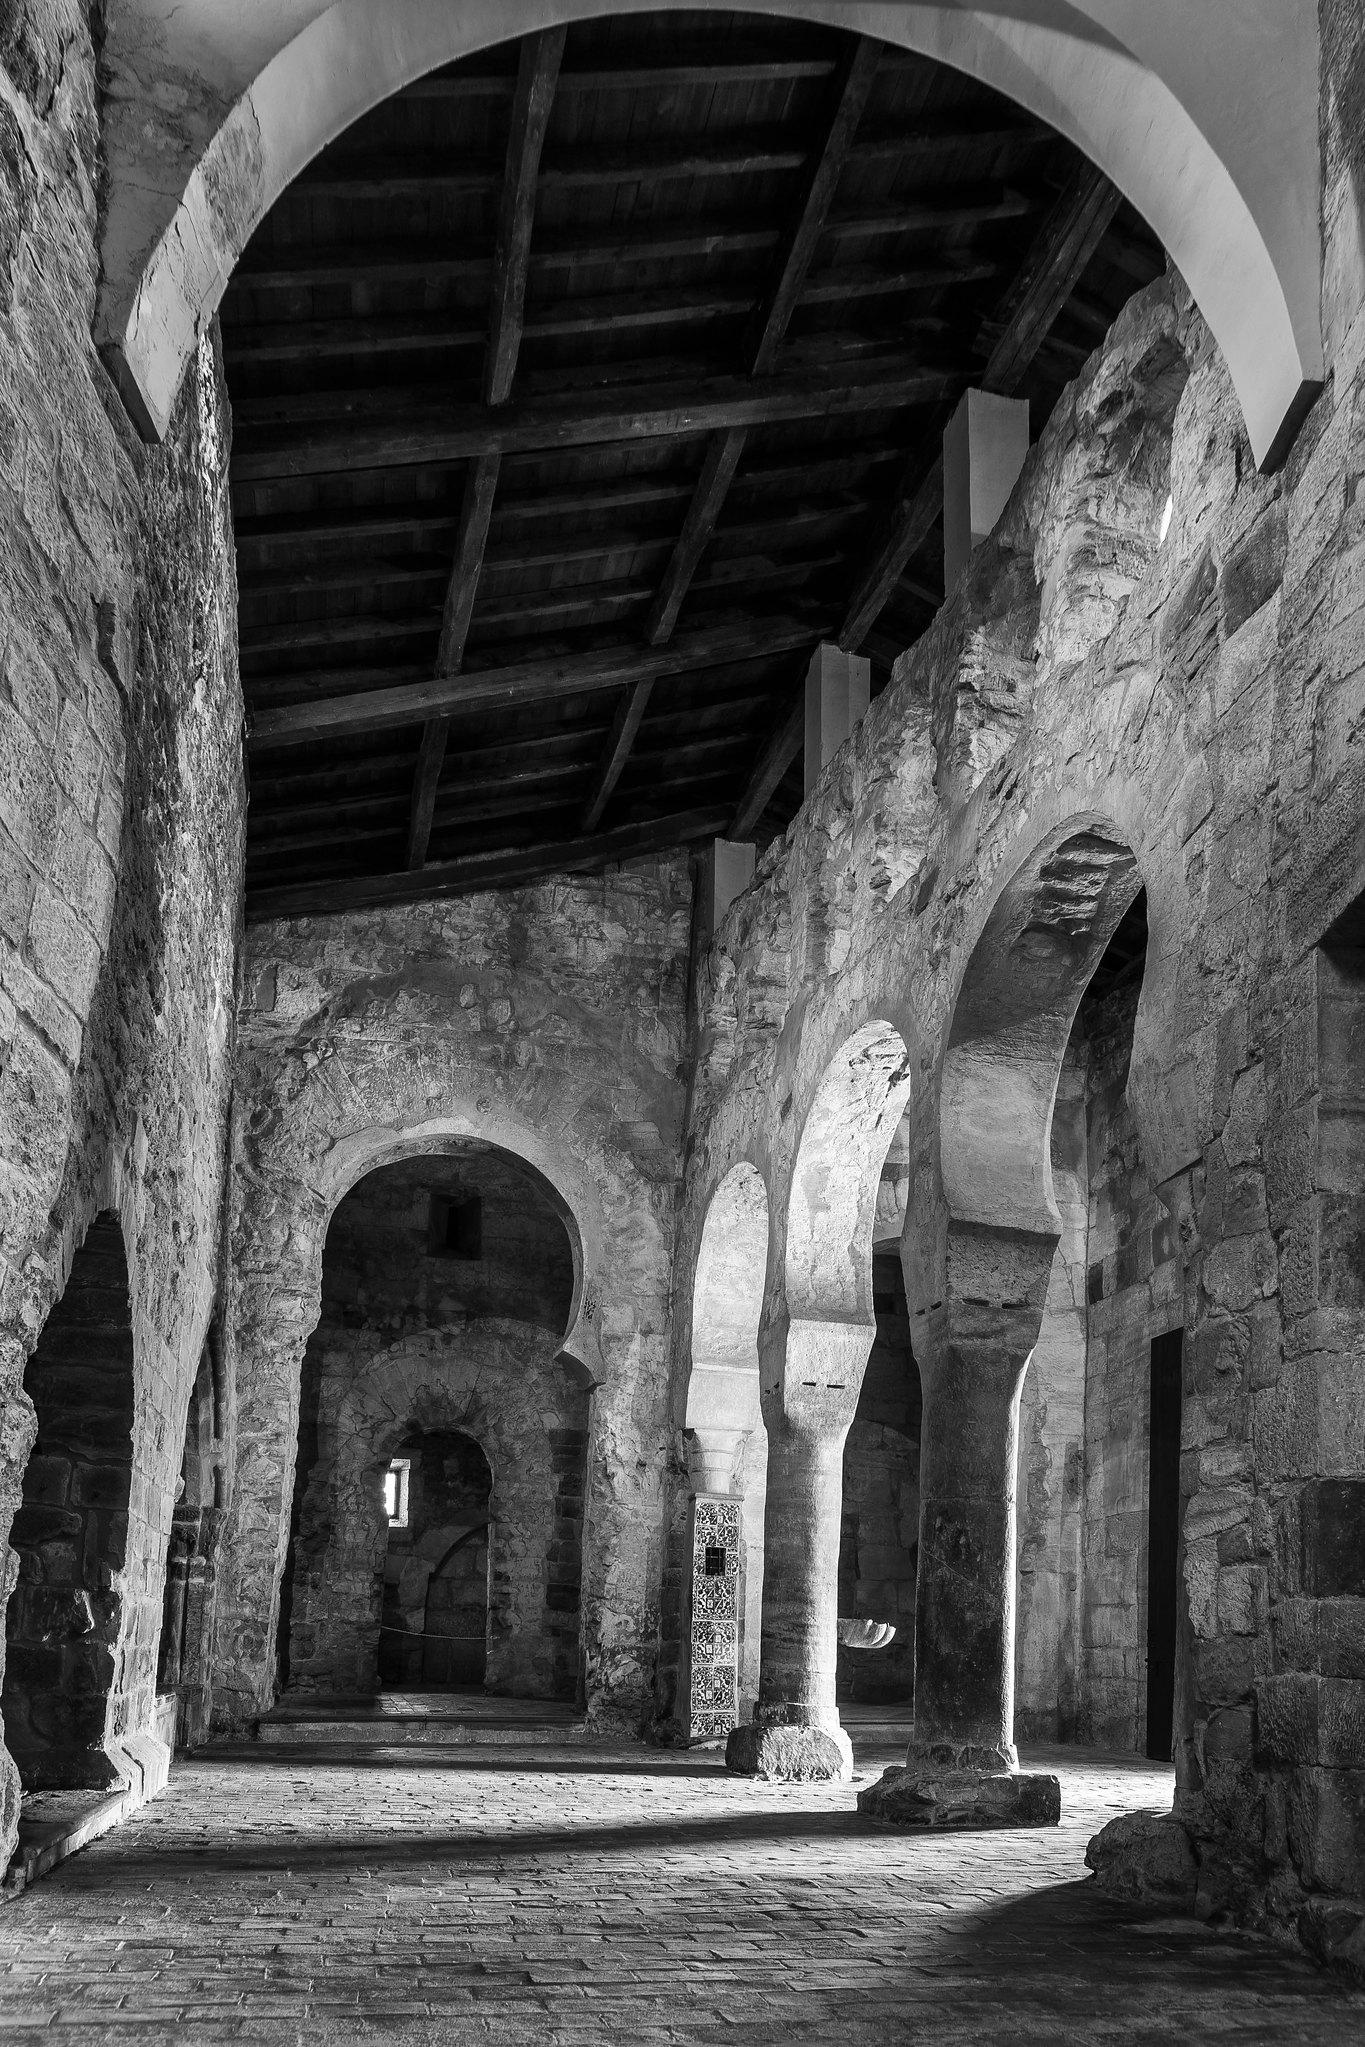 Dentro del monasterio